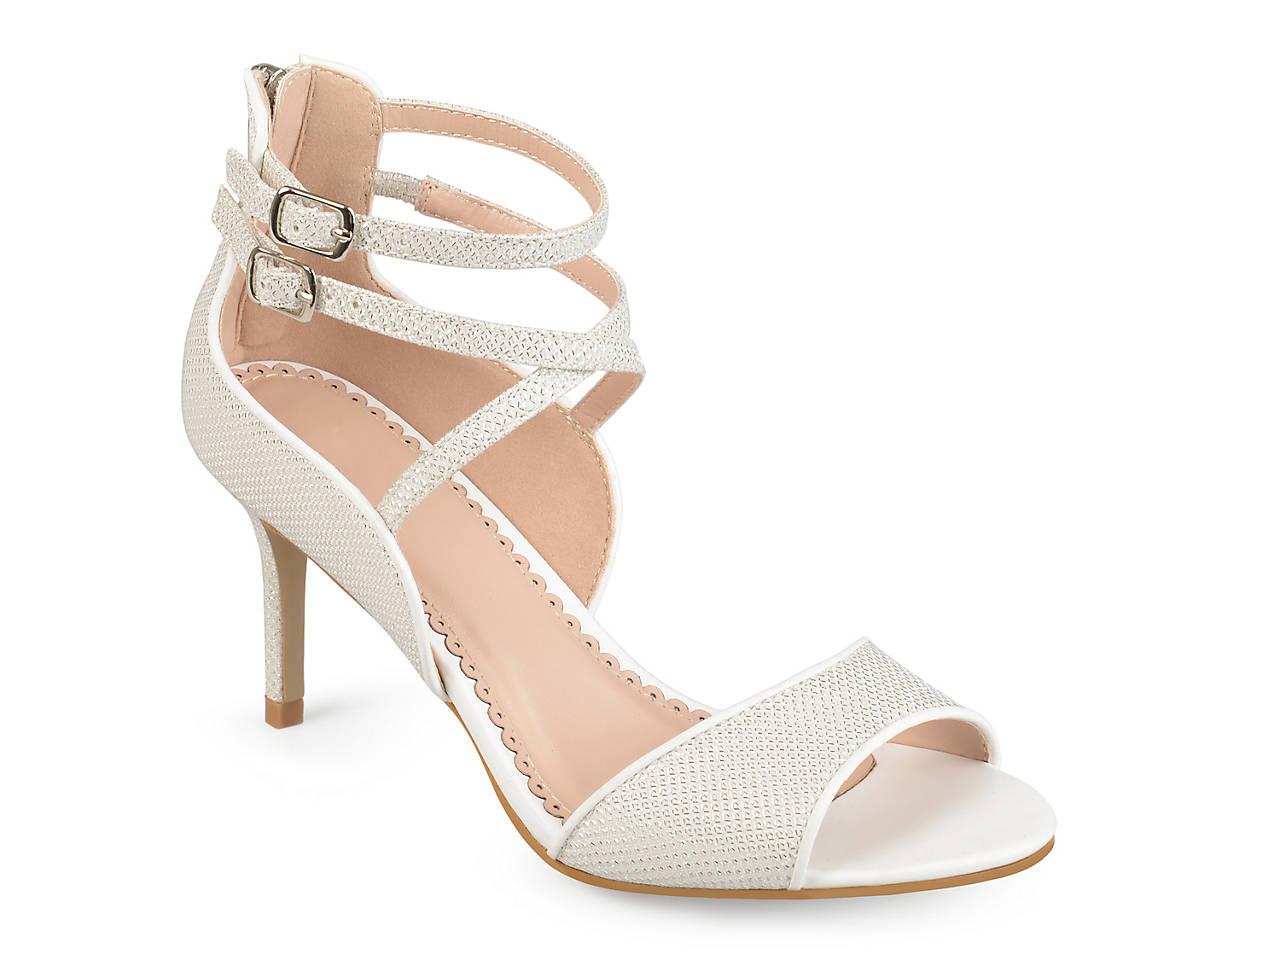 1a949c616d9 Journee Collection Bryce Sandal Women s Shoes